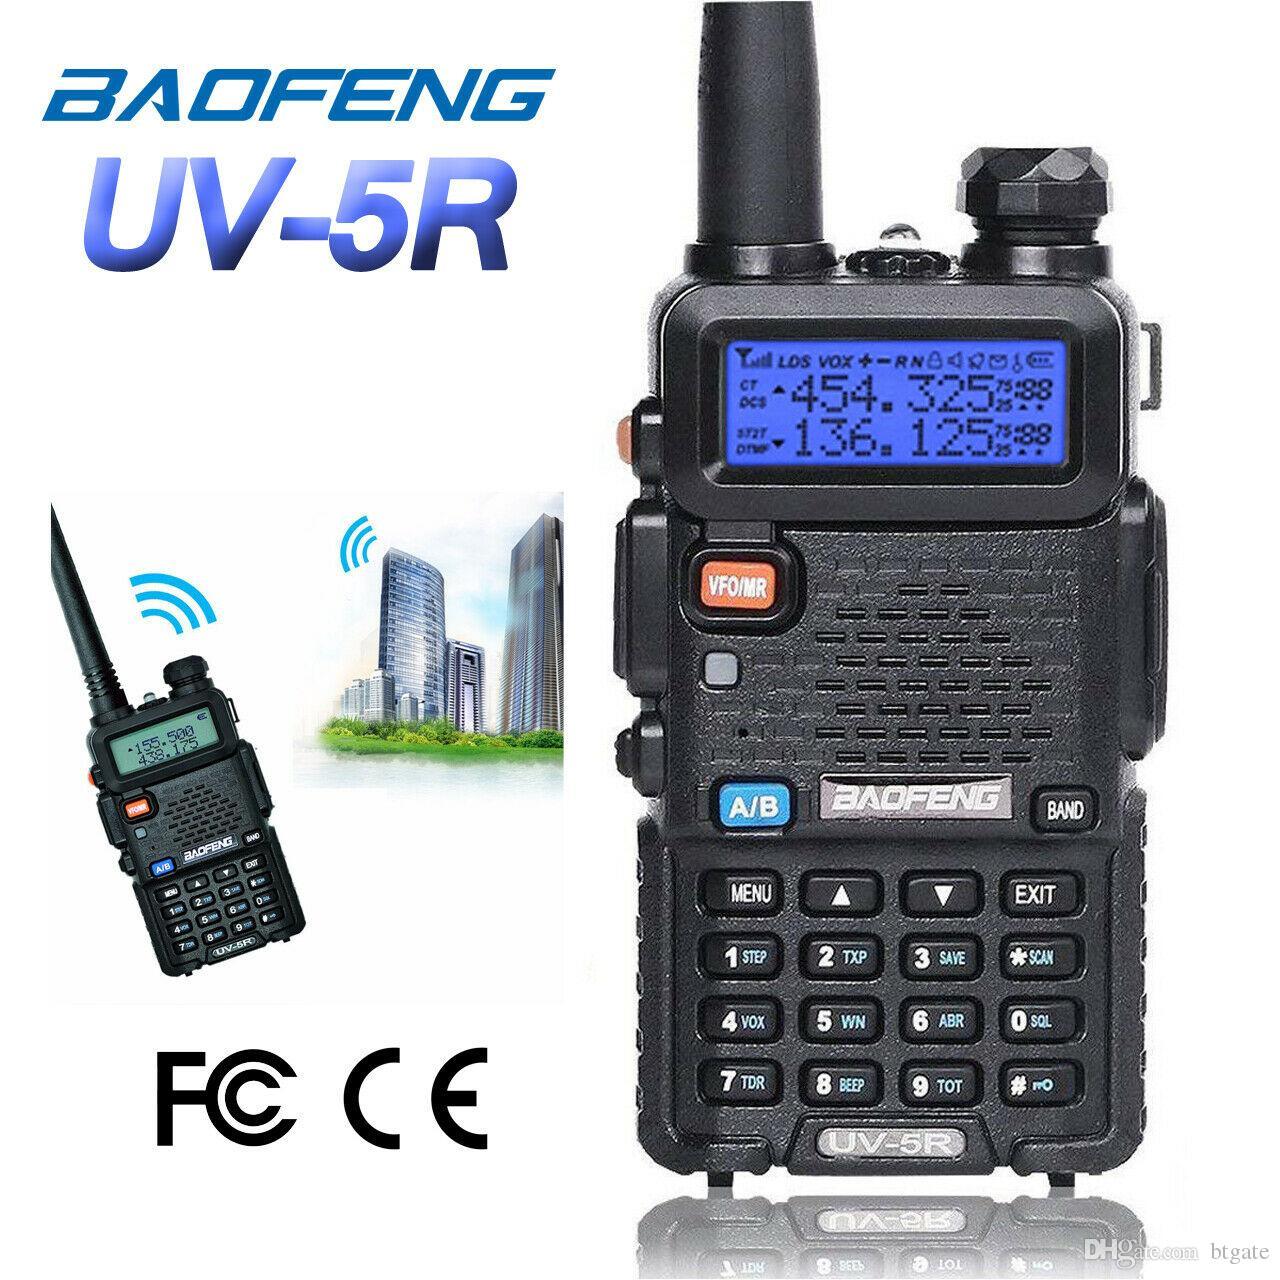 BaoFeng UV-5R UV5R 워키토키 듀얼-밴드 136-174Mhz400-520Mhz1800mAH 건전지를 가진 양용 라디오 송수신기 중대한 거래